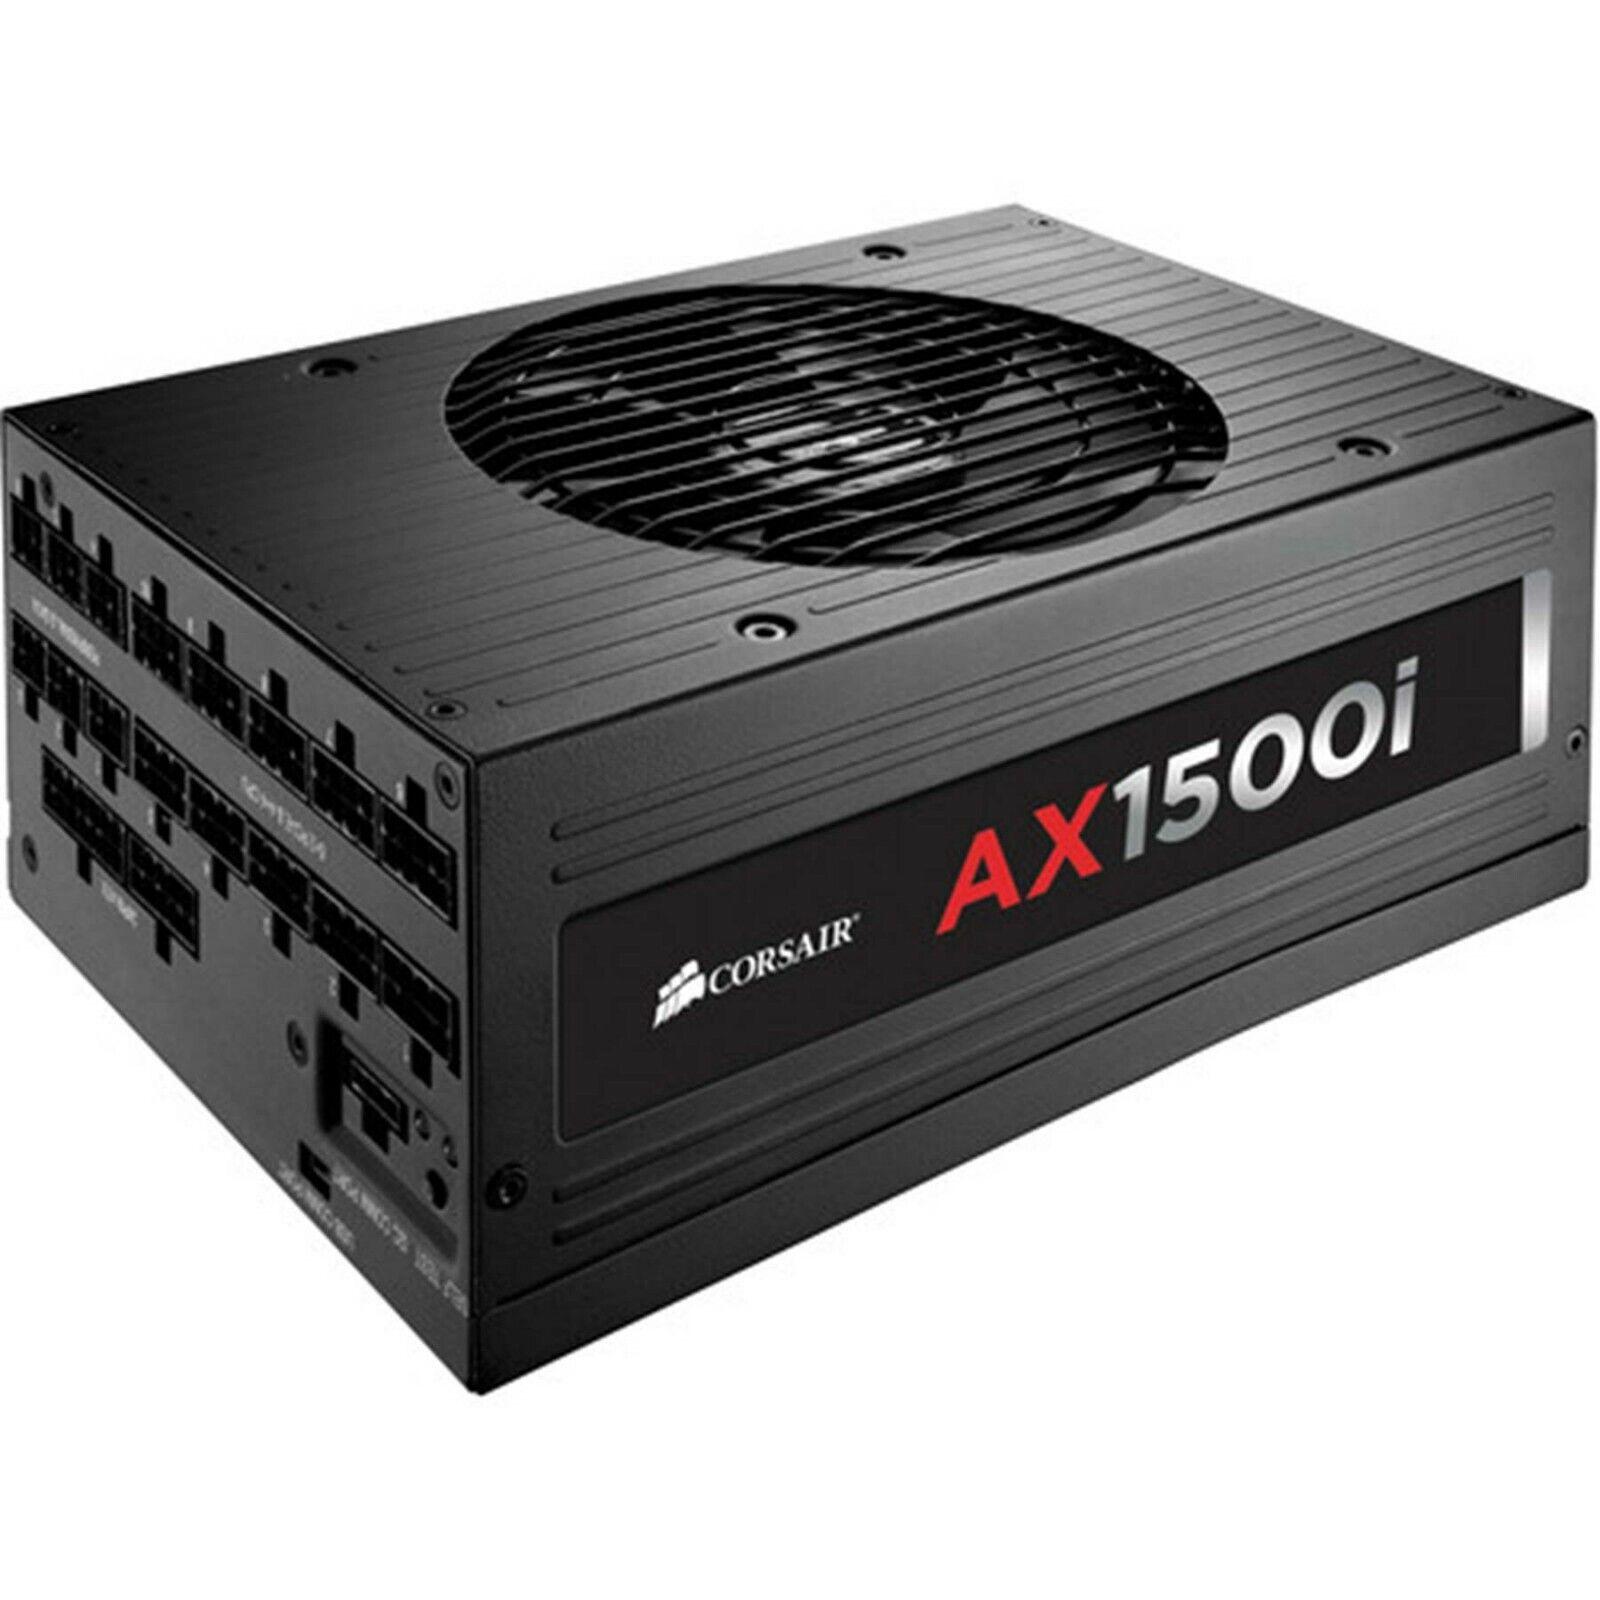 6+2pin PCI-E VGA Power Supply Cable for CORSAIR AX1500i and GPU 50cm